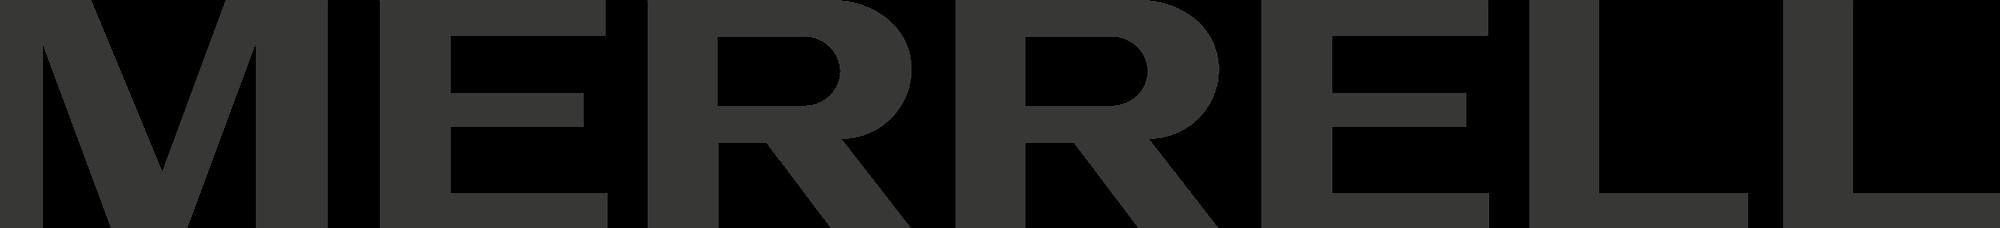 mrl_1h21_merrell_logo_gray-rgb